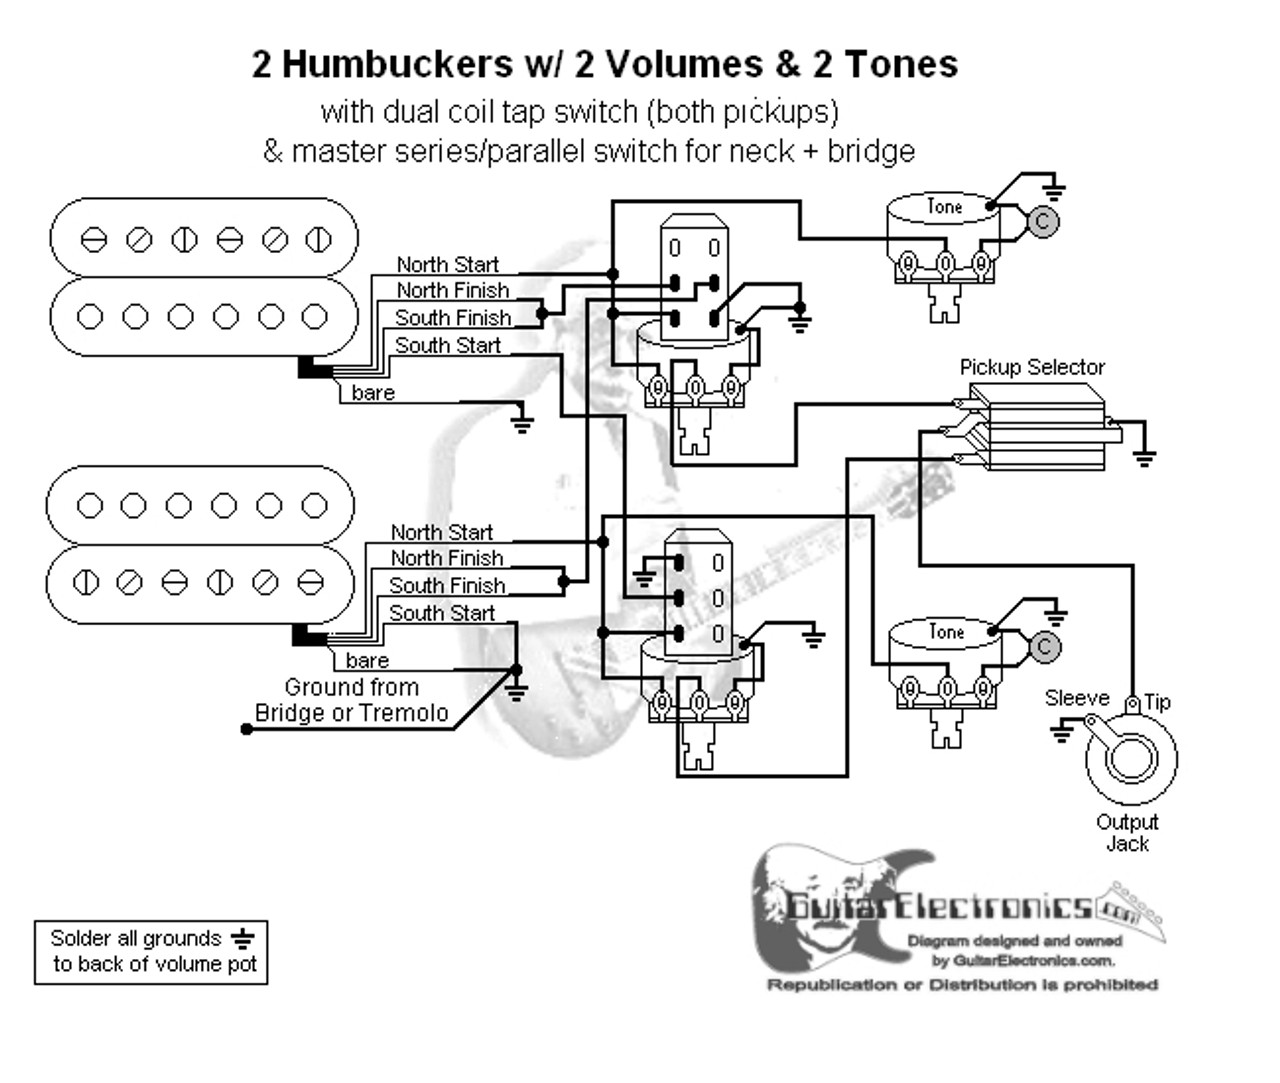 medium resolution of 2 hbs 3 way toggle 2 vol 2 tones coil tap u0026 series parallel2 humbuckers